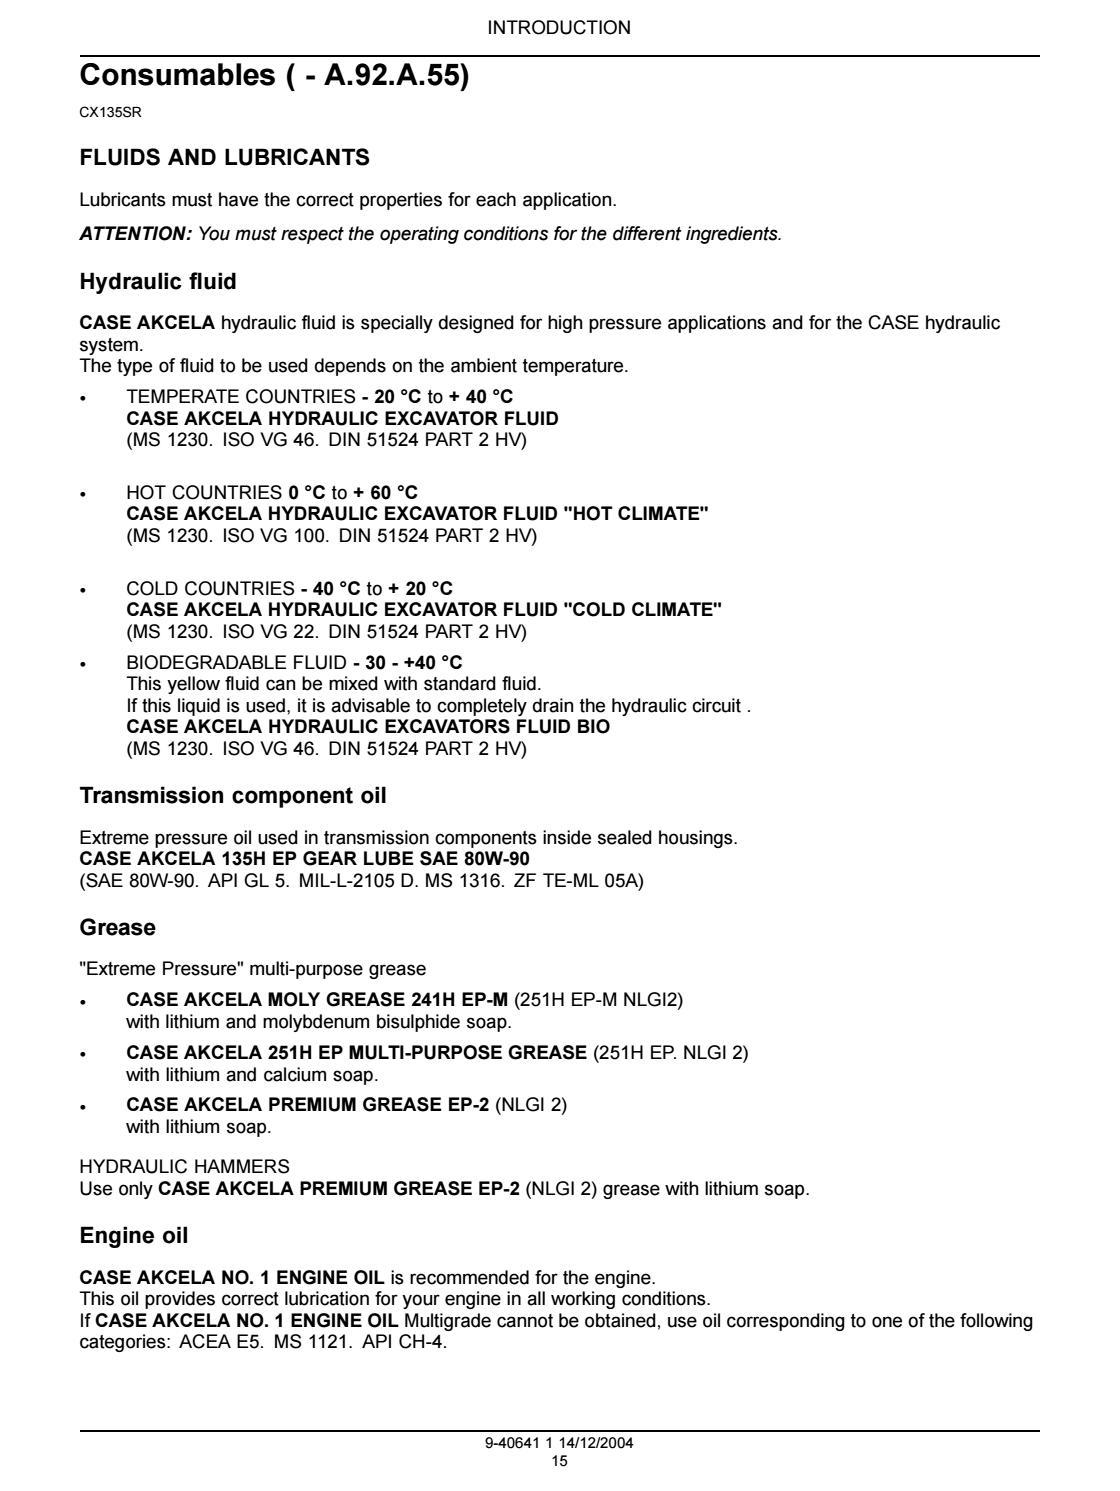 CASE CX135SR CRAWLER EXCAVATOR Service Repair Manual by